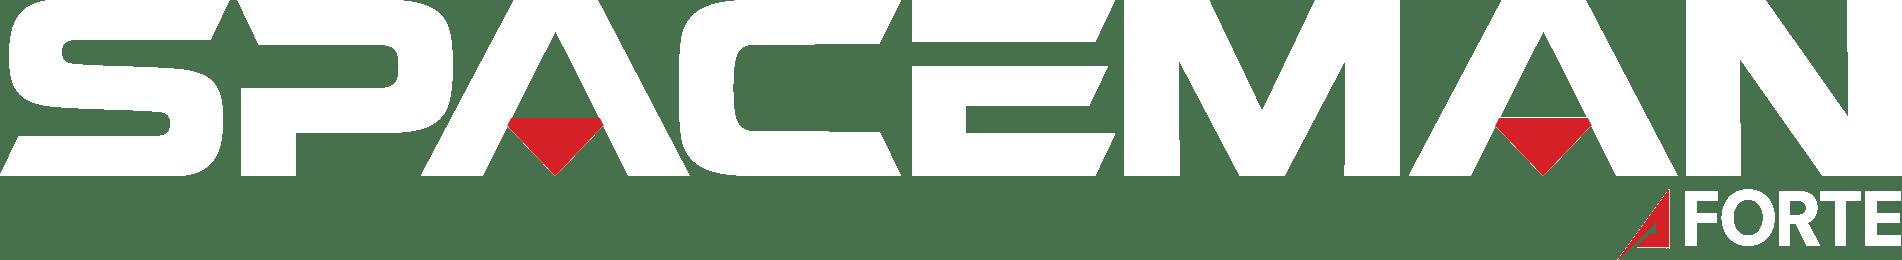 20210329_Spaceman Logo_White